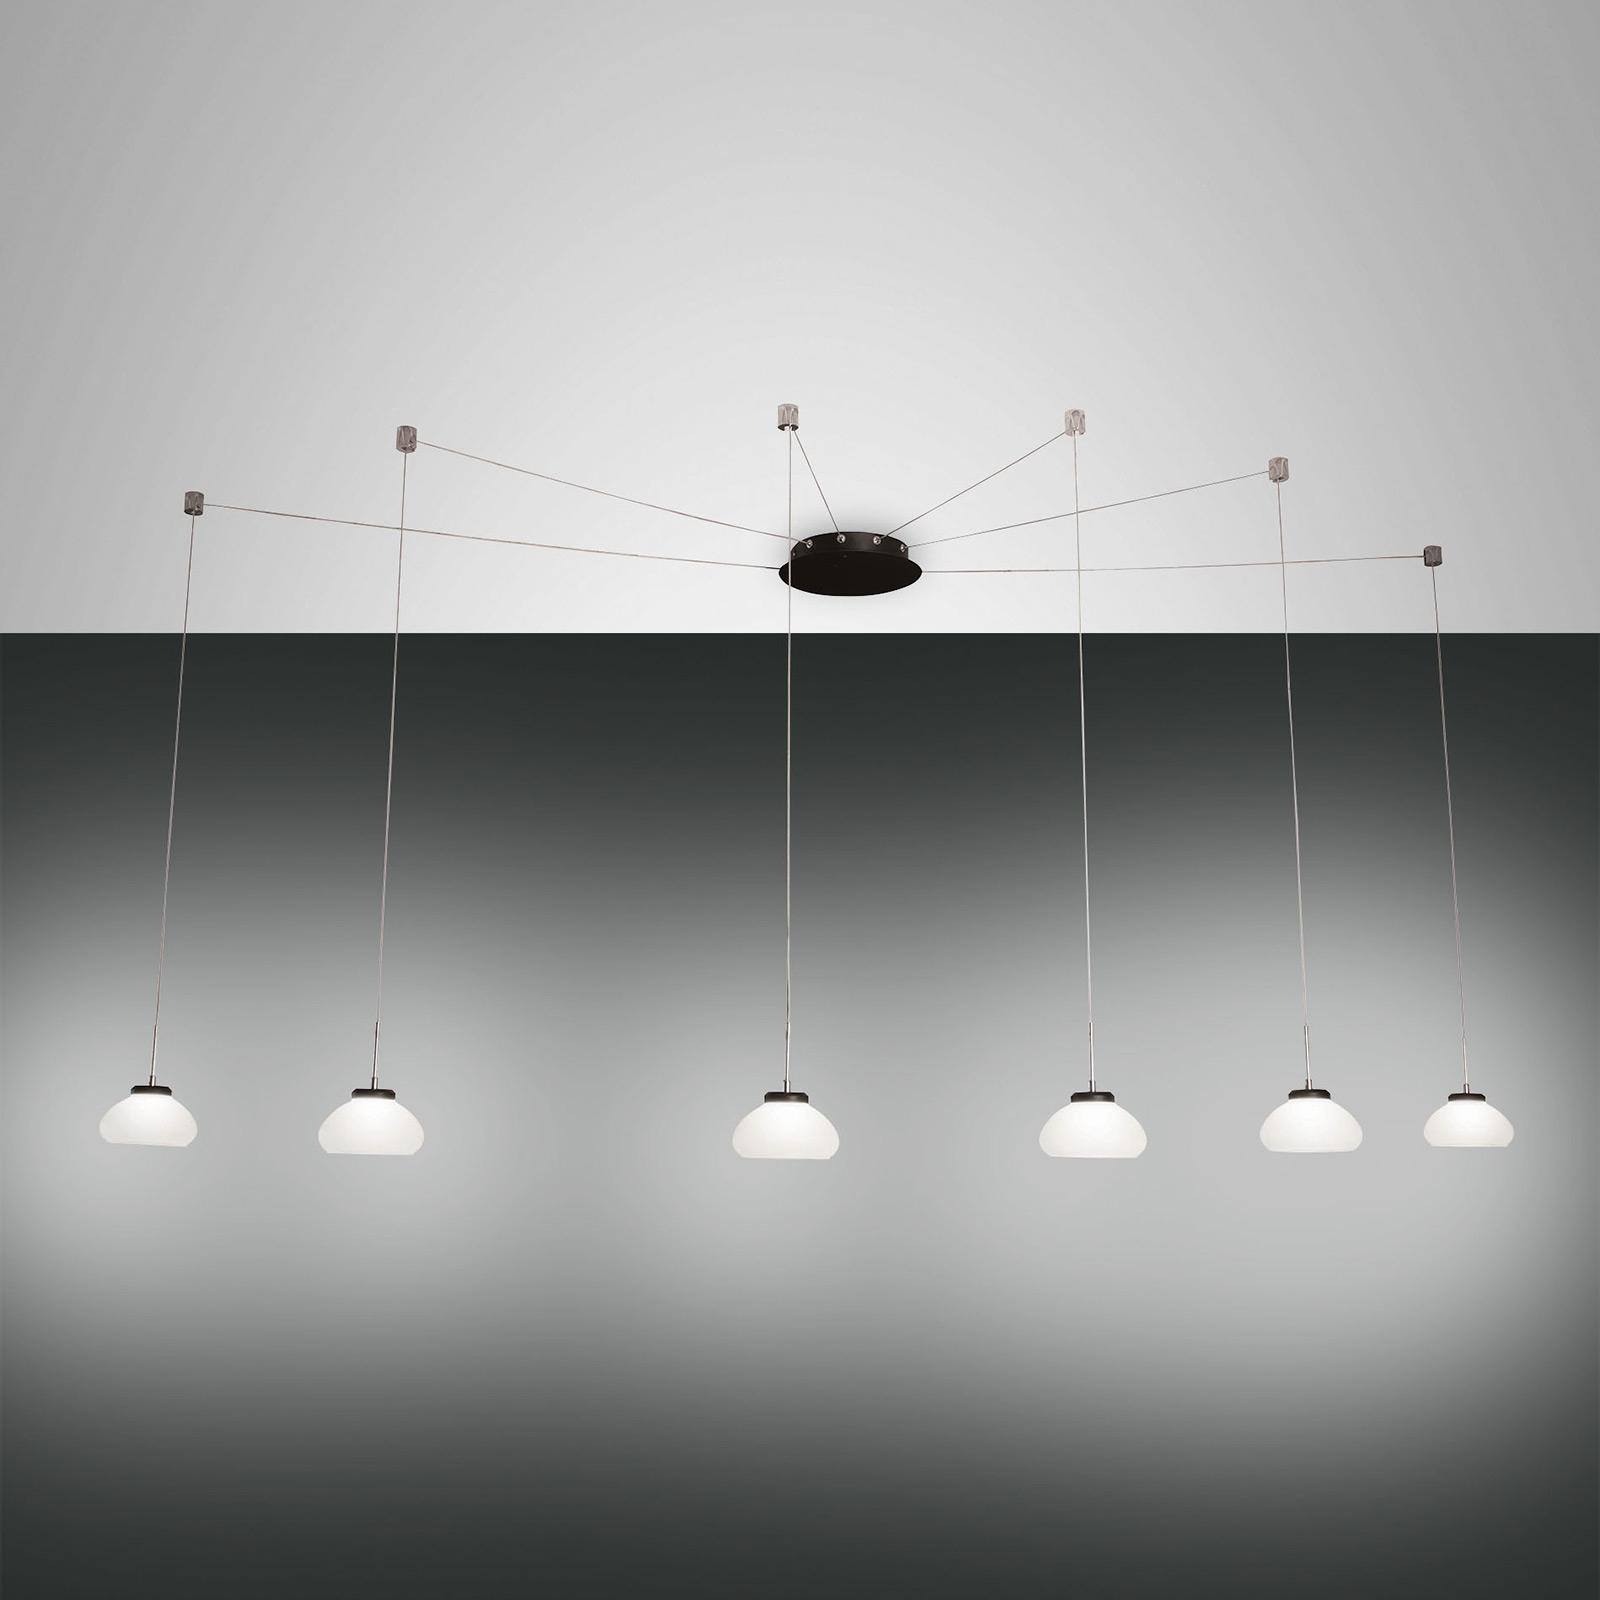 Lampa wisząca Arabella decentralna, 6-pkt. biała